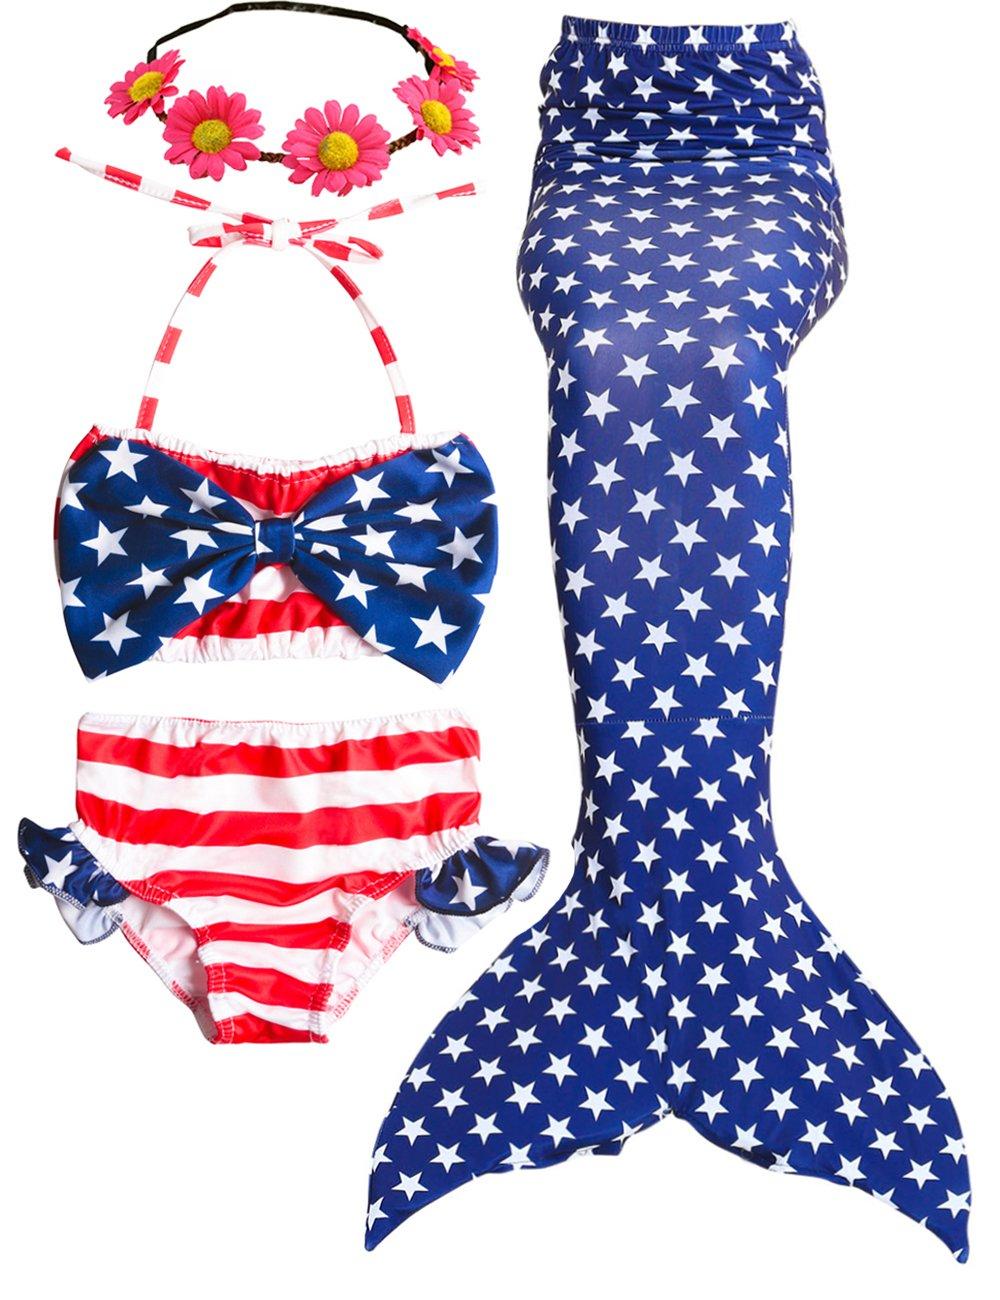 AMENON USA Flag Girls Swimsuits Mermaid Tails for Swimming Summer Bikini with Monofin